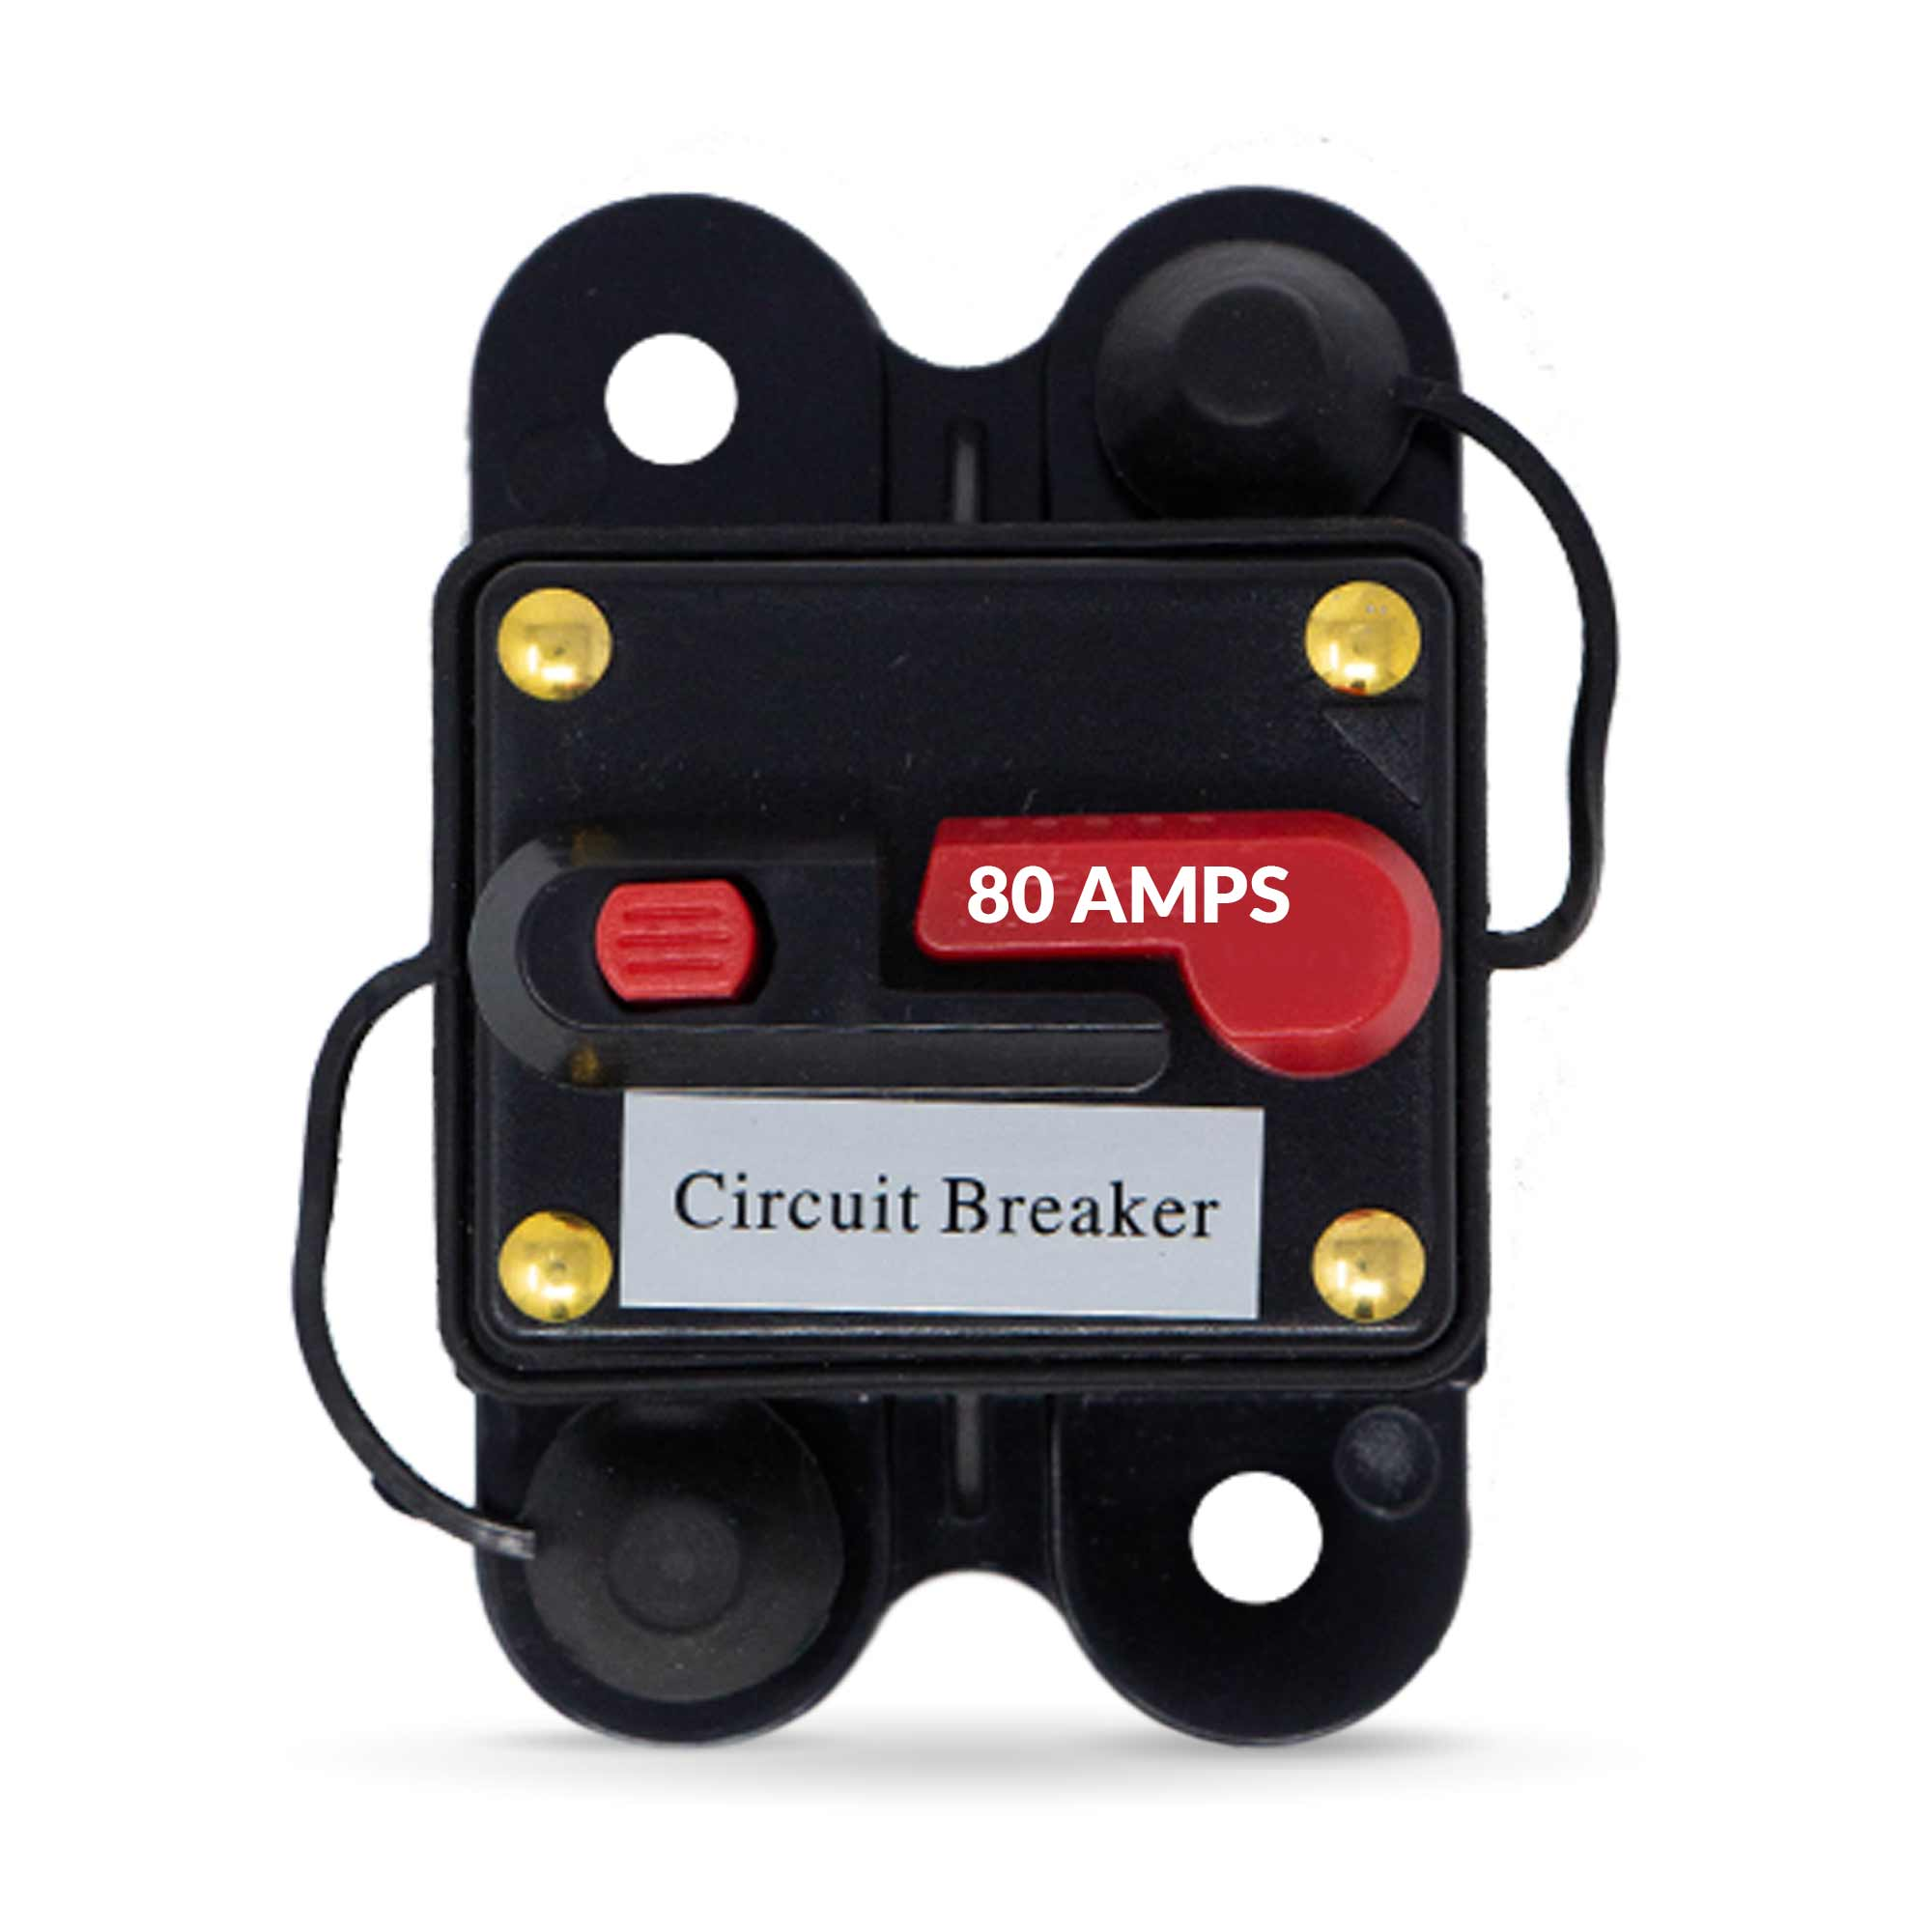 Five Oceans Marine circuit breaker (80amp) for Anchor Windlass FO-3294